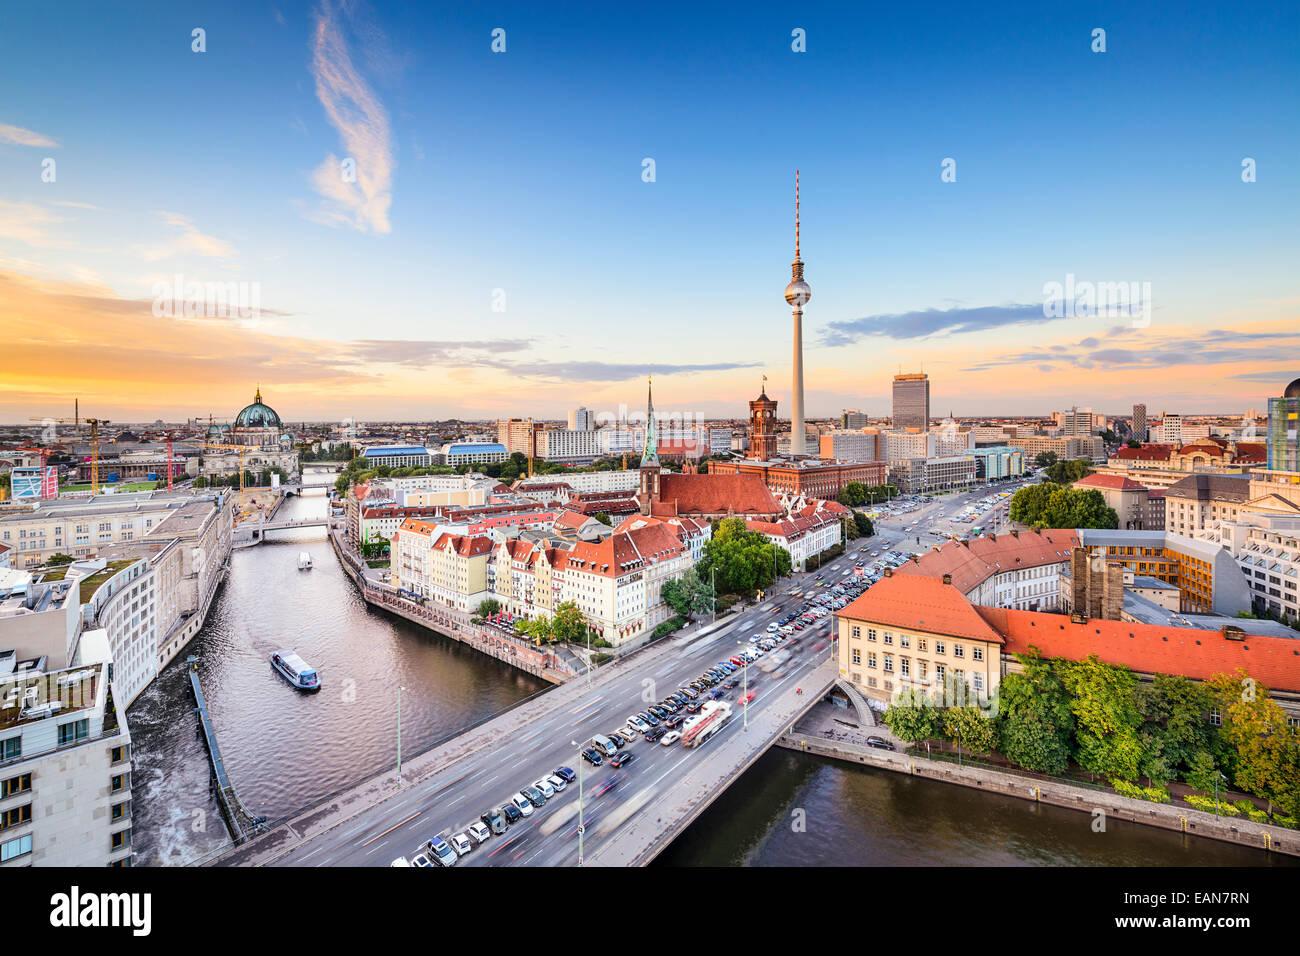 Berlin, Germany skyline on the Spree River. - Stock Image